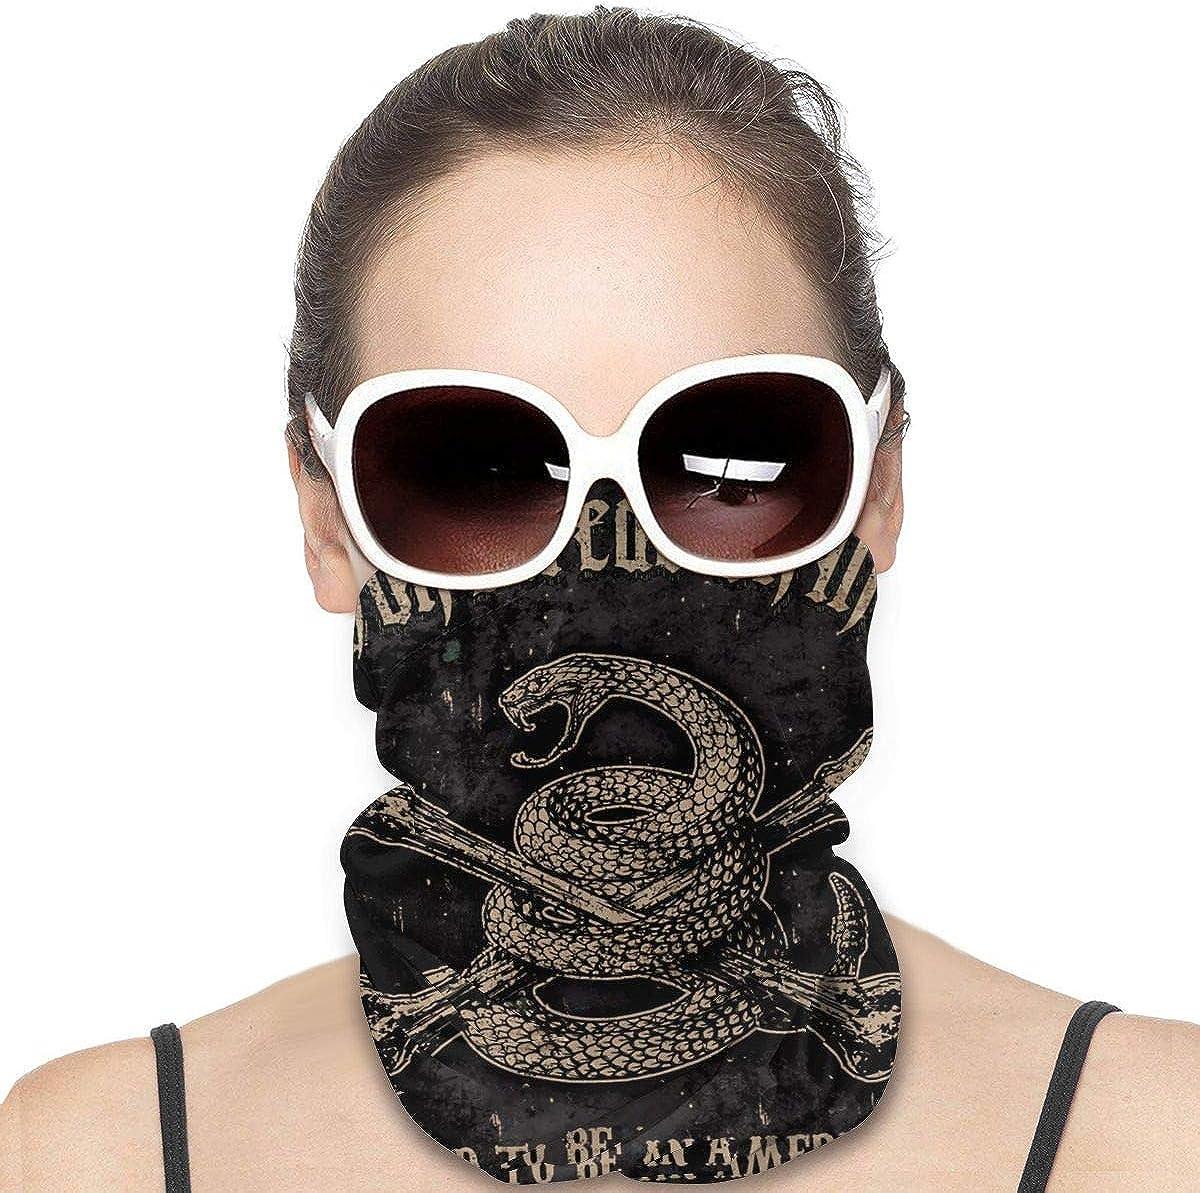 Neck Gaiters for Men - Vintage Dont Tread On Me Snake Motorcycle Mask Fishing Multifunctional Headwear Head Bands Neck Gaiters for Men Headscarf Sun Mask